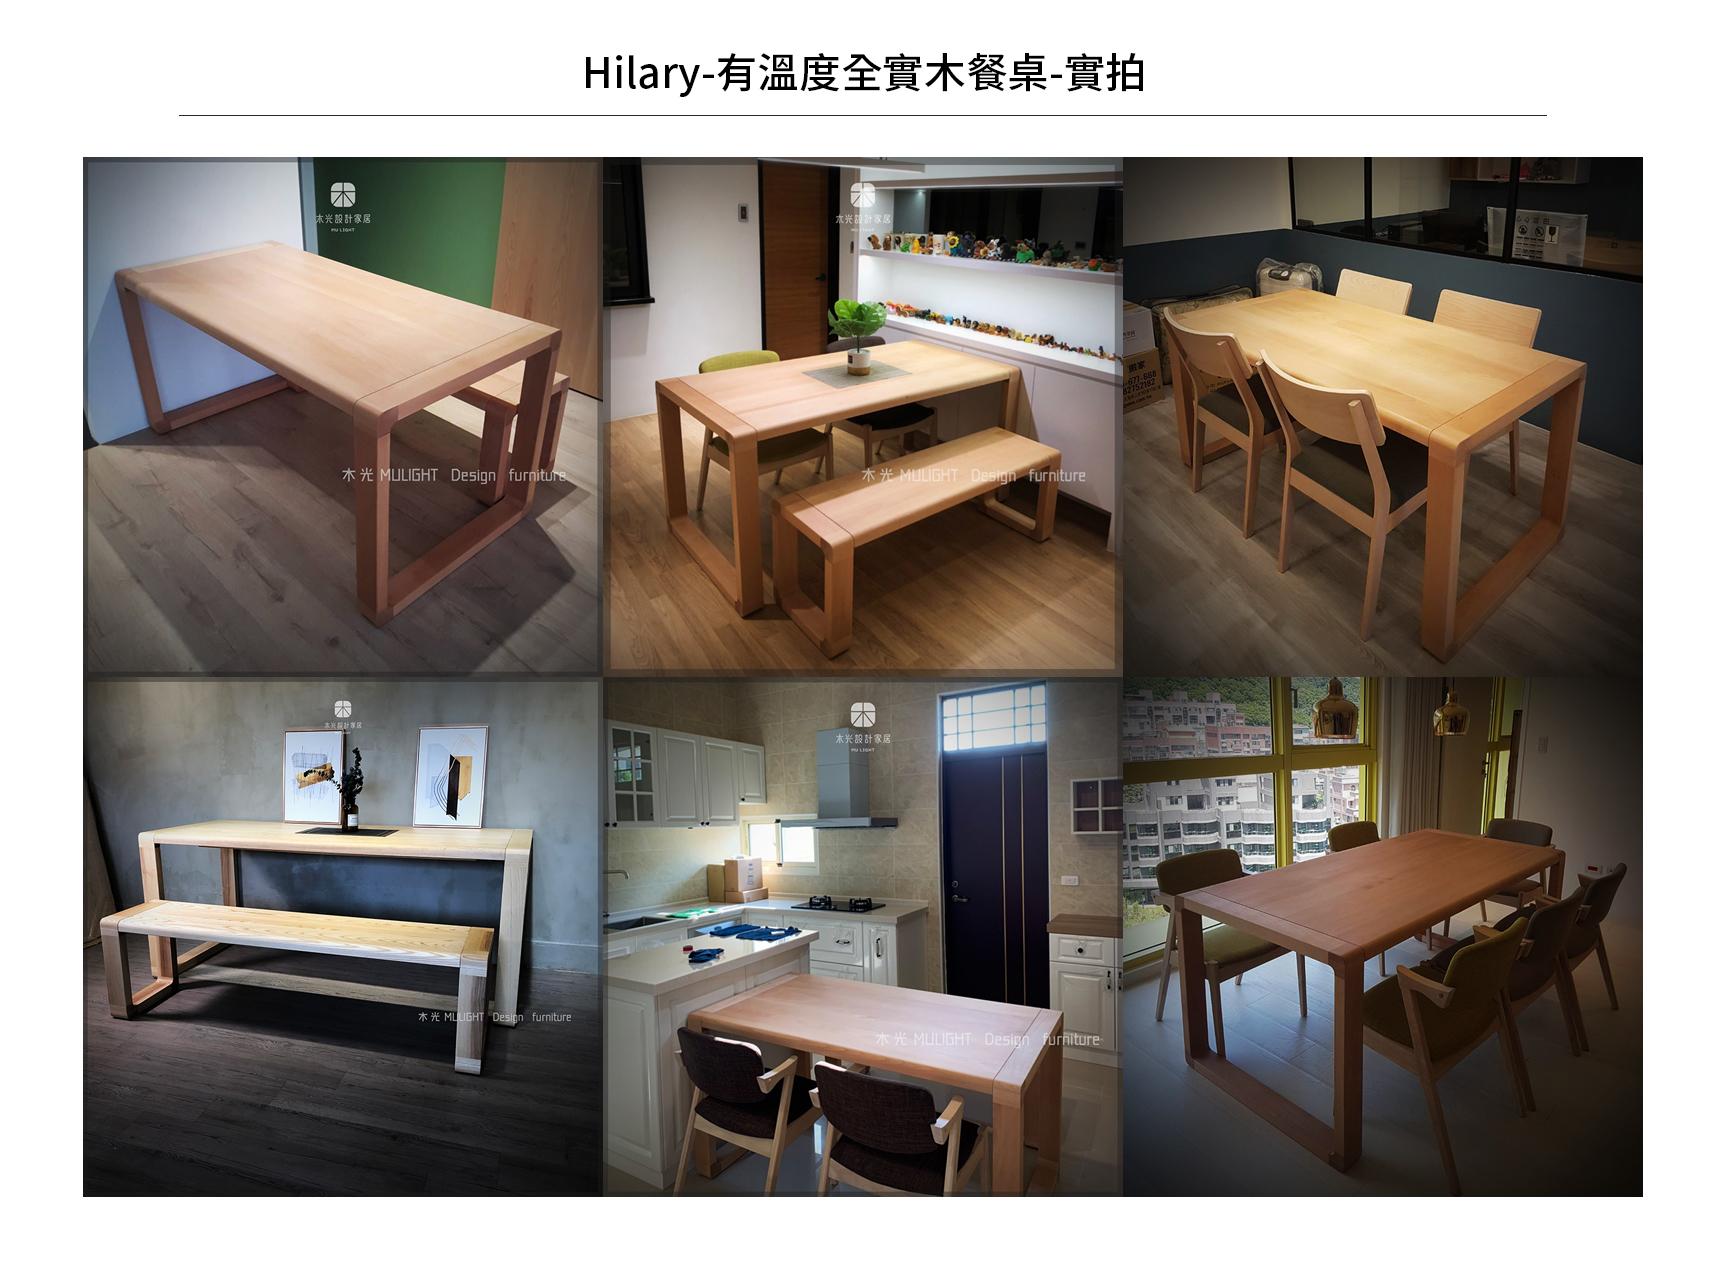 Hilary-有溫度全實木餐桌(可訂製)